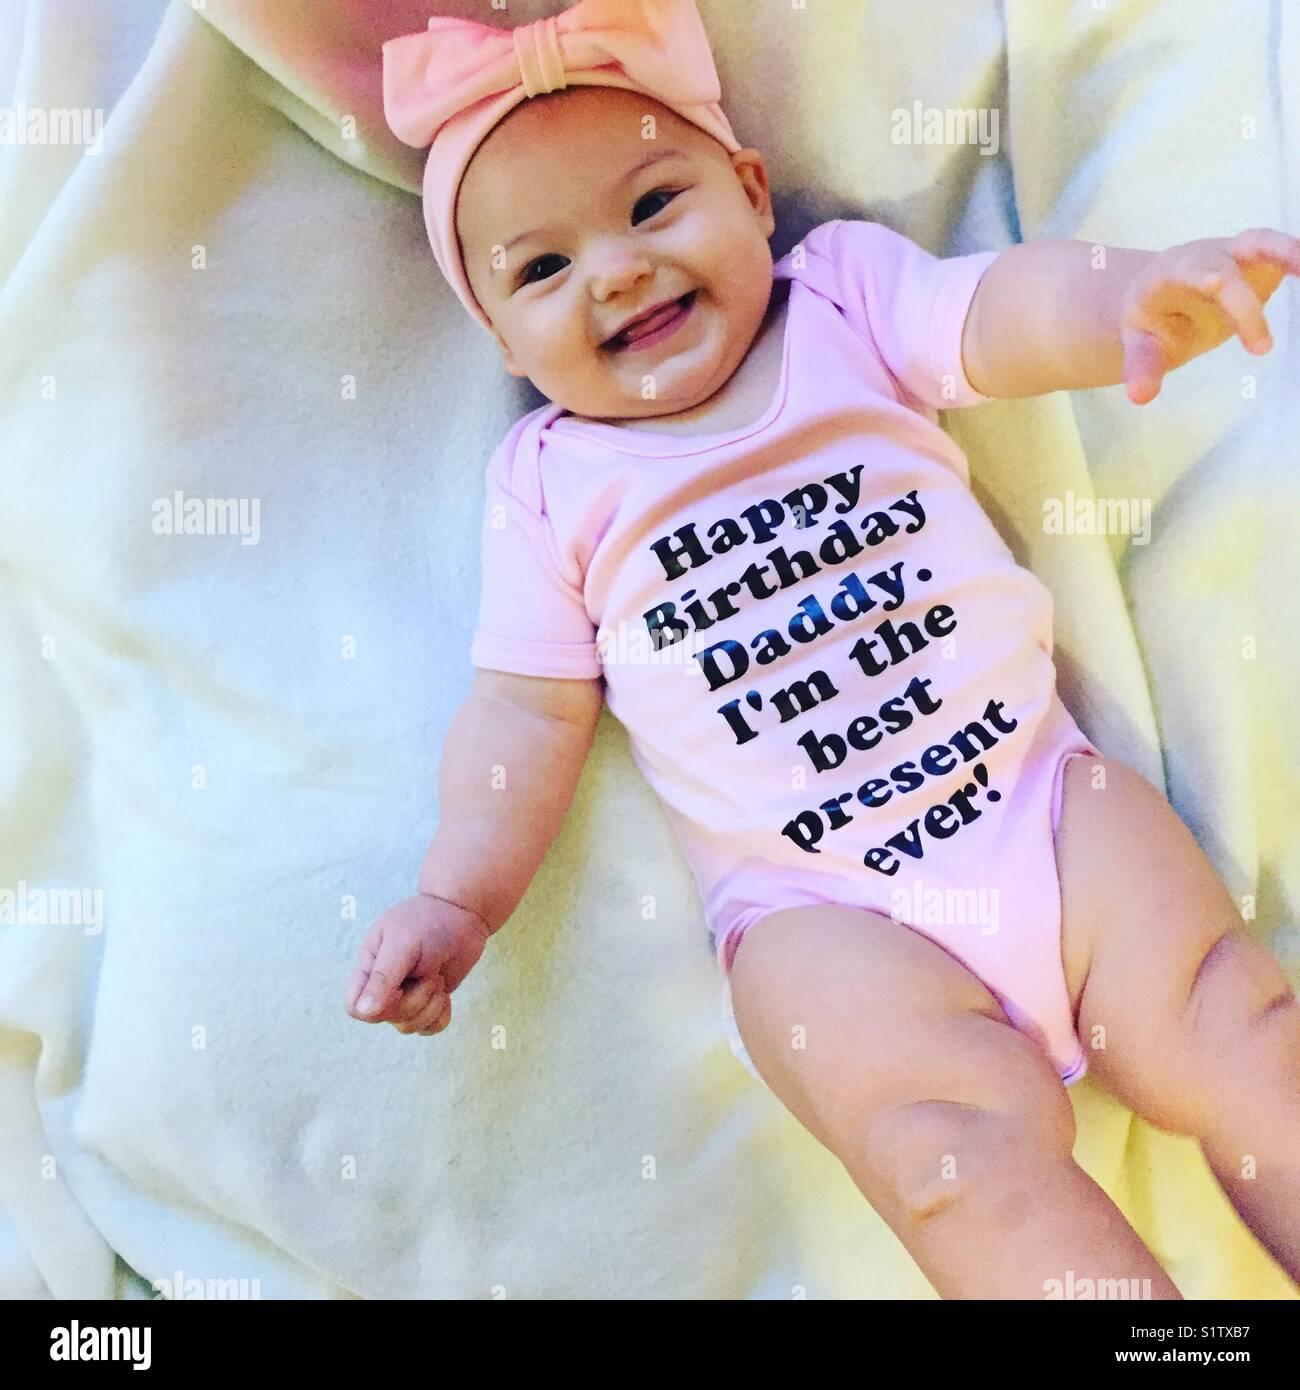 Happy Birthday Daddy Im The Best Present Ever